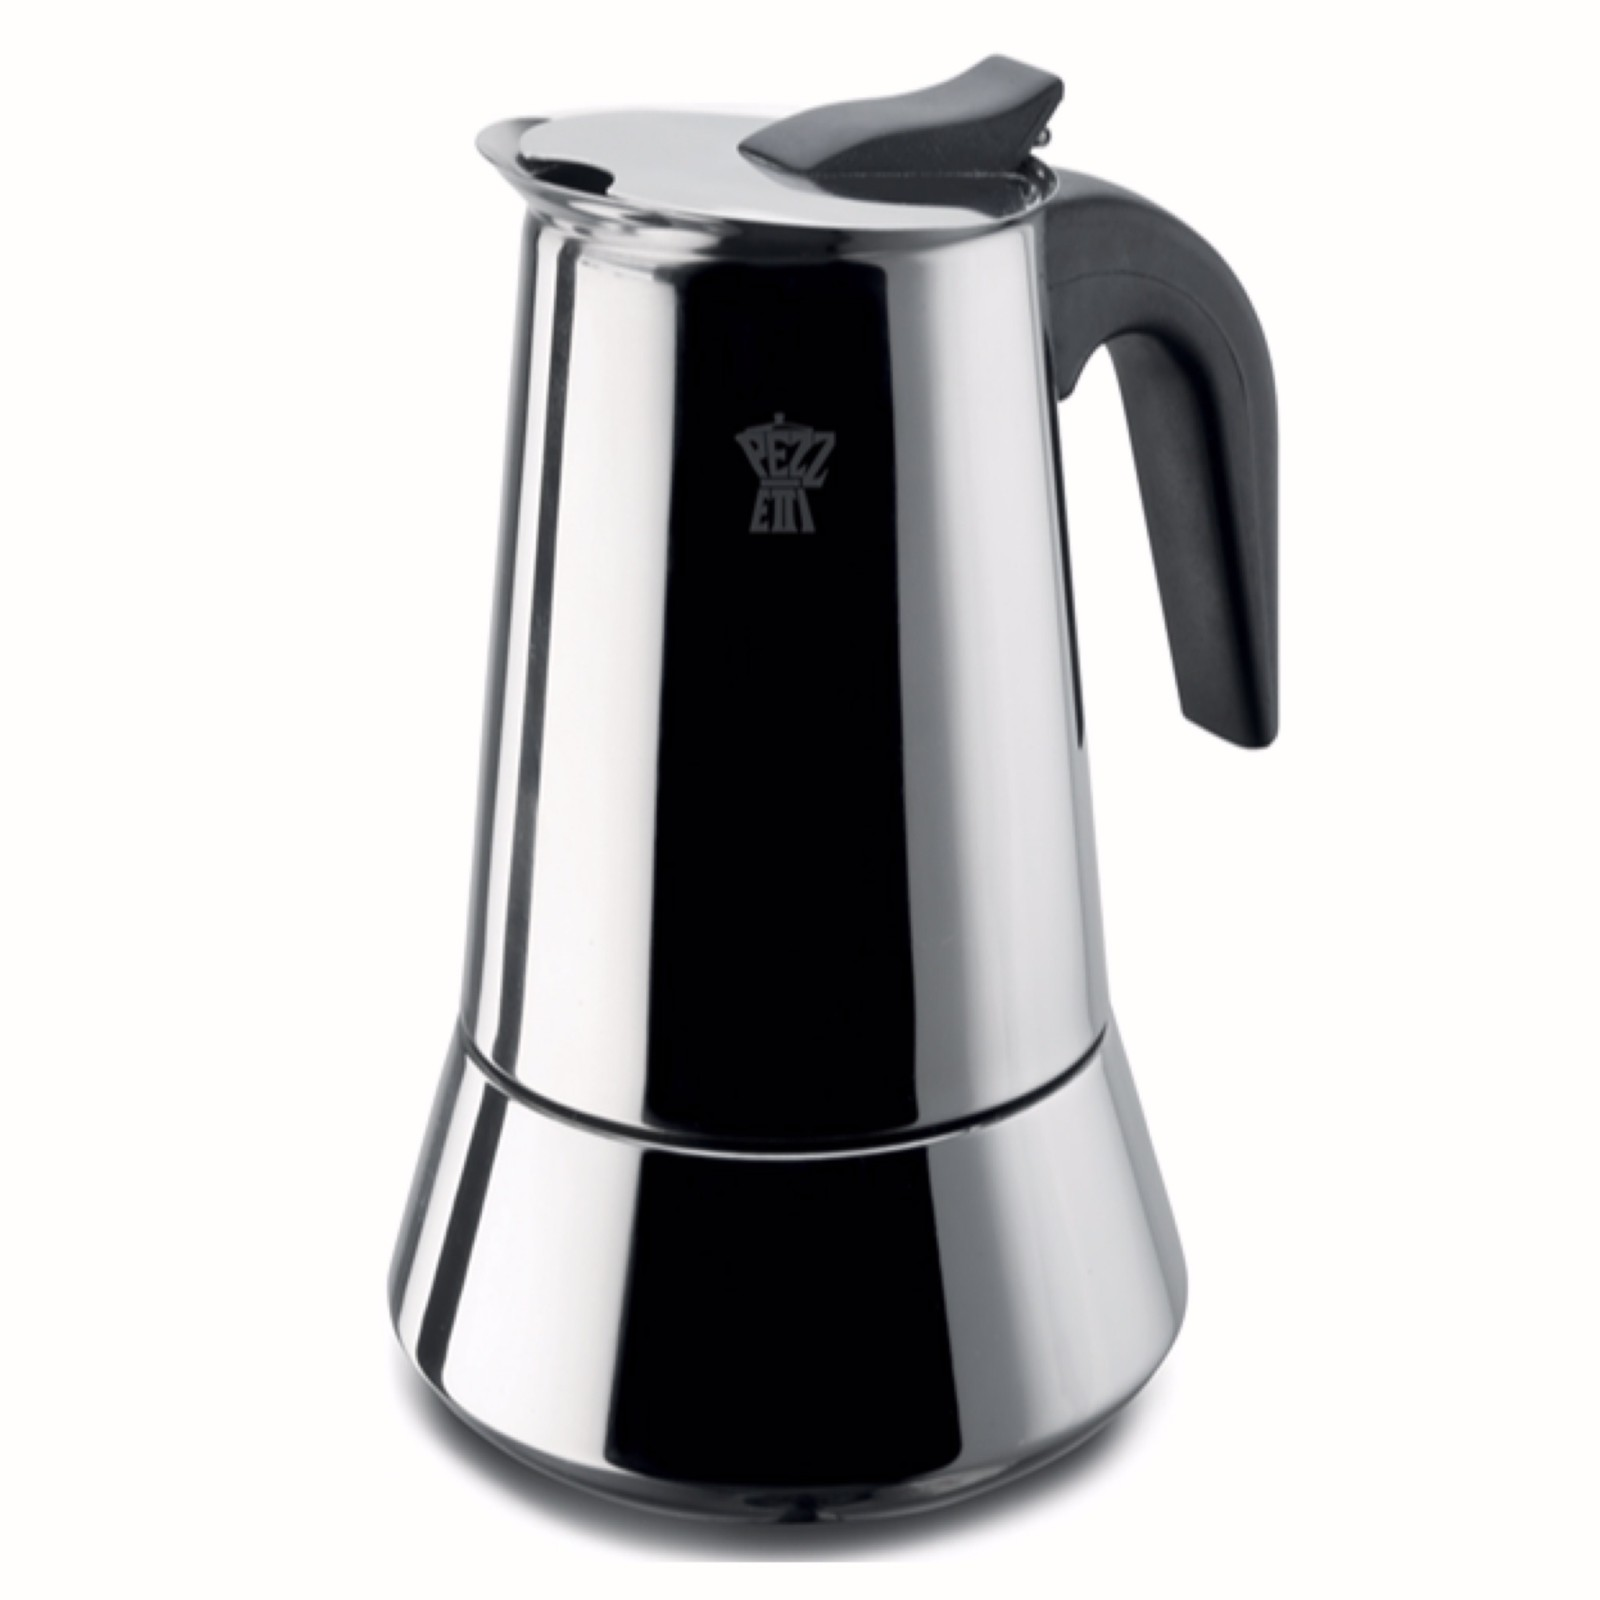 Pezzetti Steelexpress Moka Pot – 4 Cup